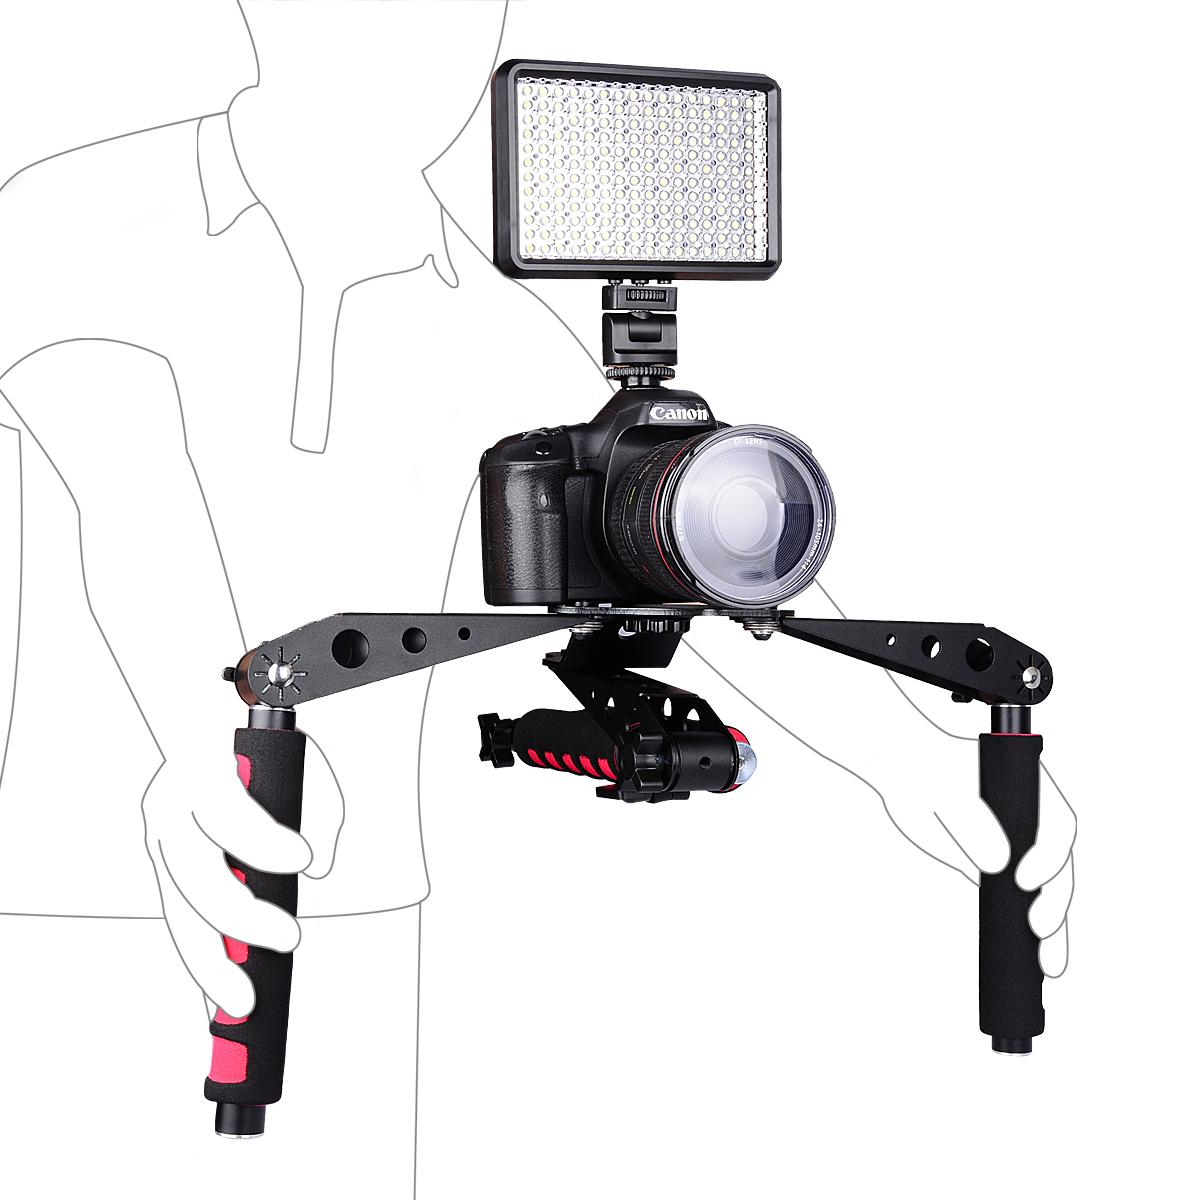 YELANGU Multi Flexibility Low Angle Shooting DSLR Shoulder Rig For 5D2,60D,D90